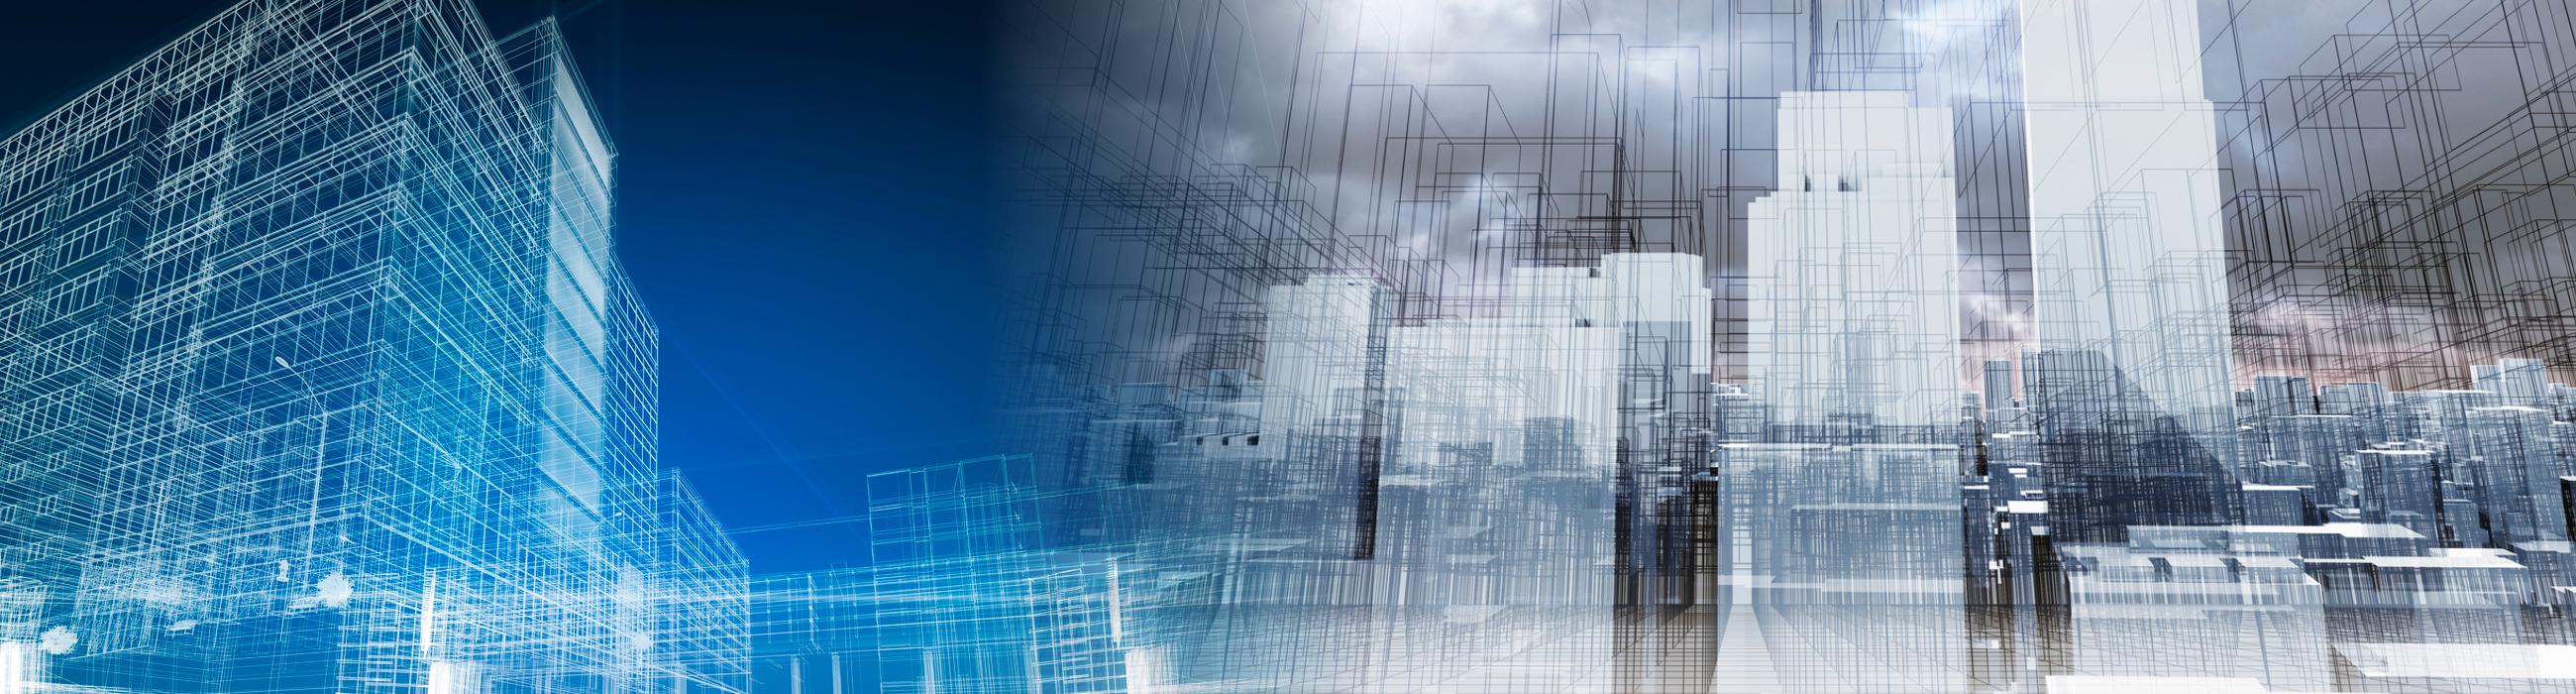 Building Information Modelling (BIM) Certification